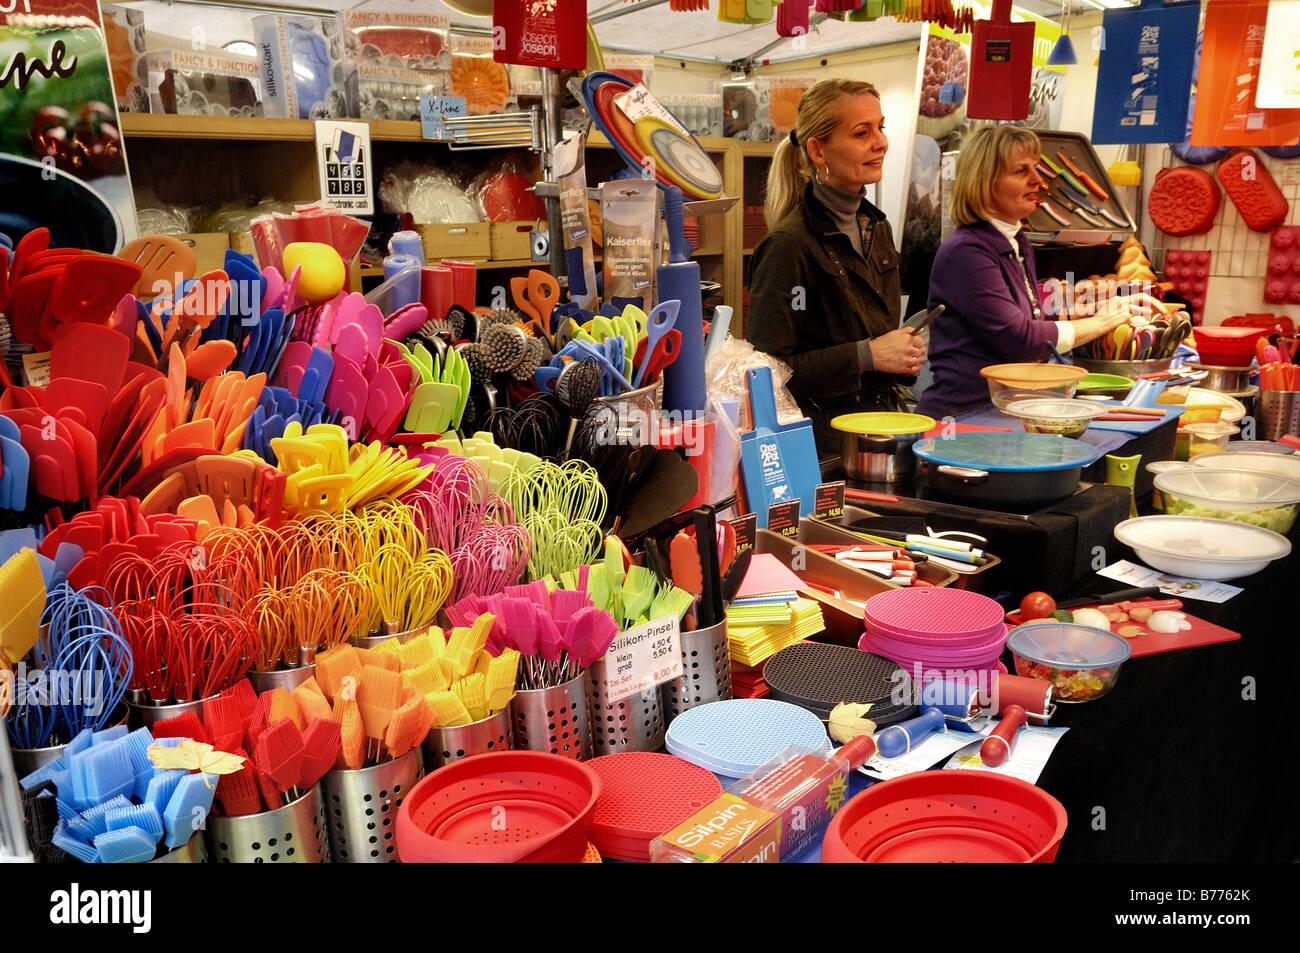 Stall with plastic kitchen utensils, Auer Dult market, Munich, Bavaria, Germany, Europe - Stock Image